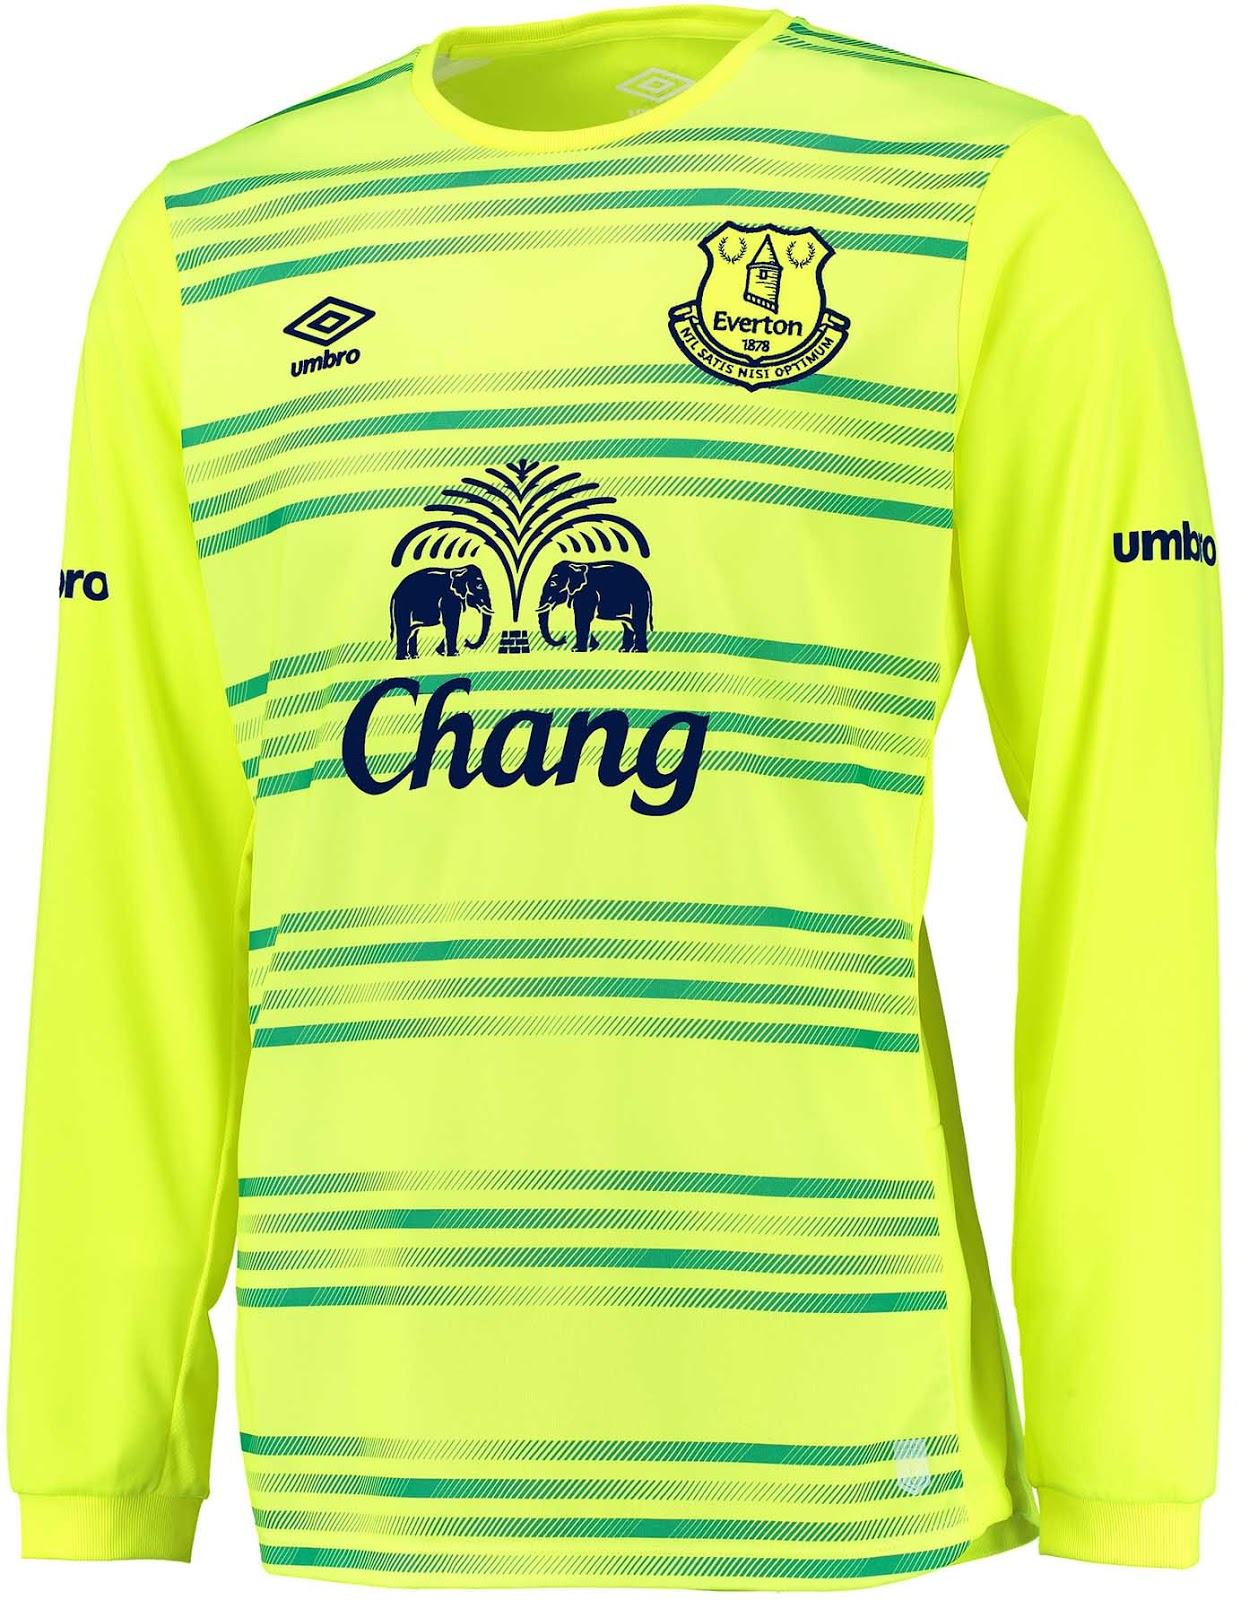 Everton 15-16 Kits Released - Footy Headlines